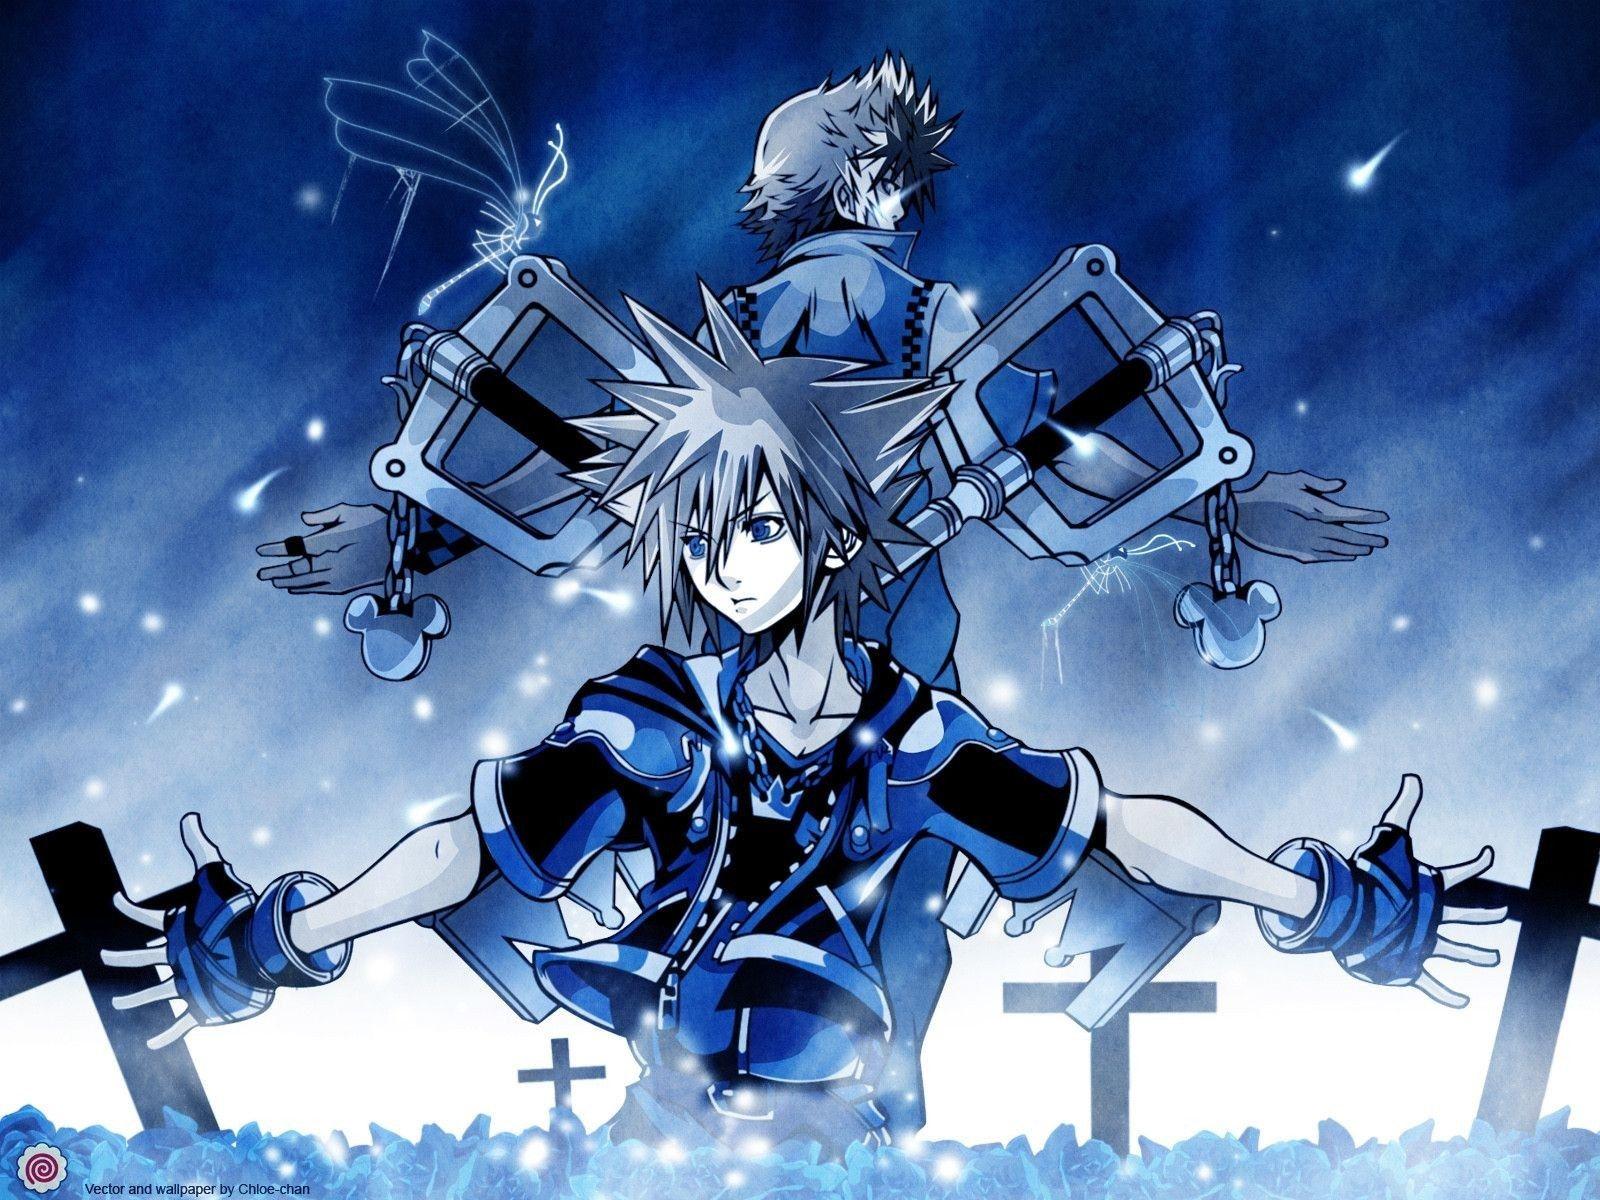 Cool Kingdom Hearts Kingdom Hearts Wallpaper Kingdom Hearts Kingdom Hearts Hd